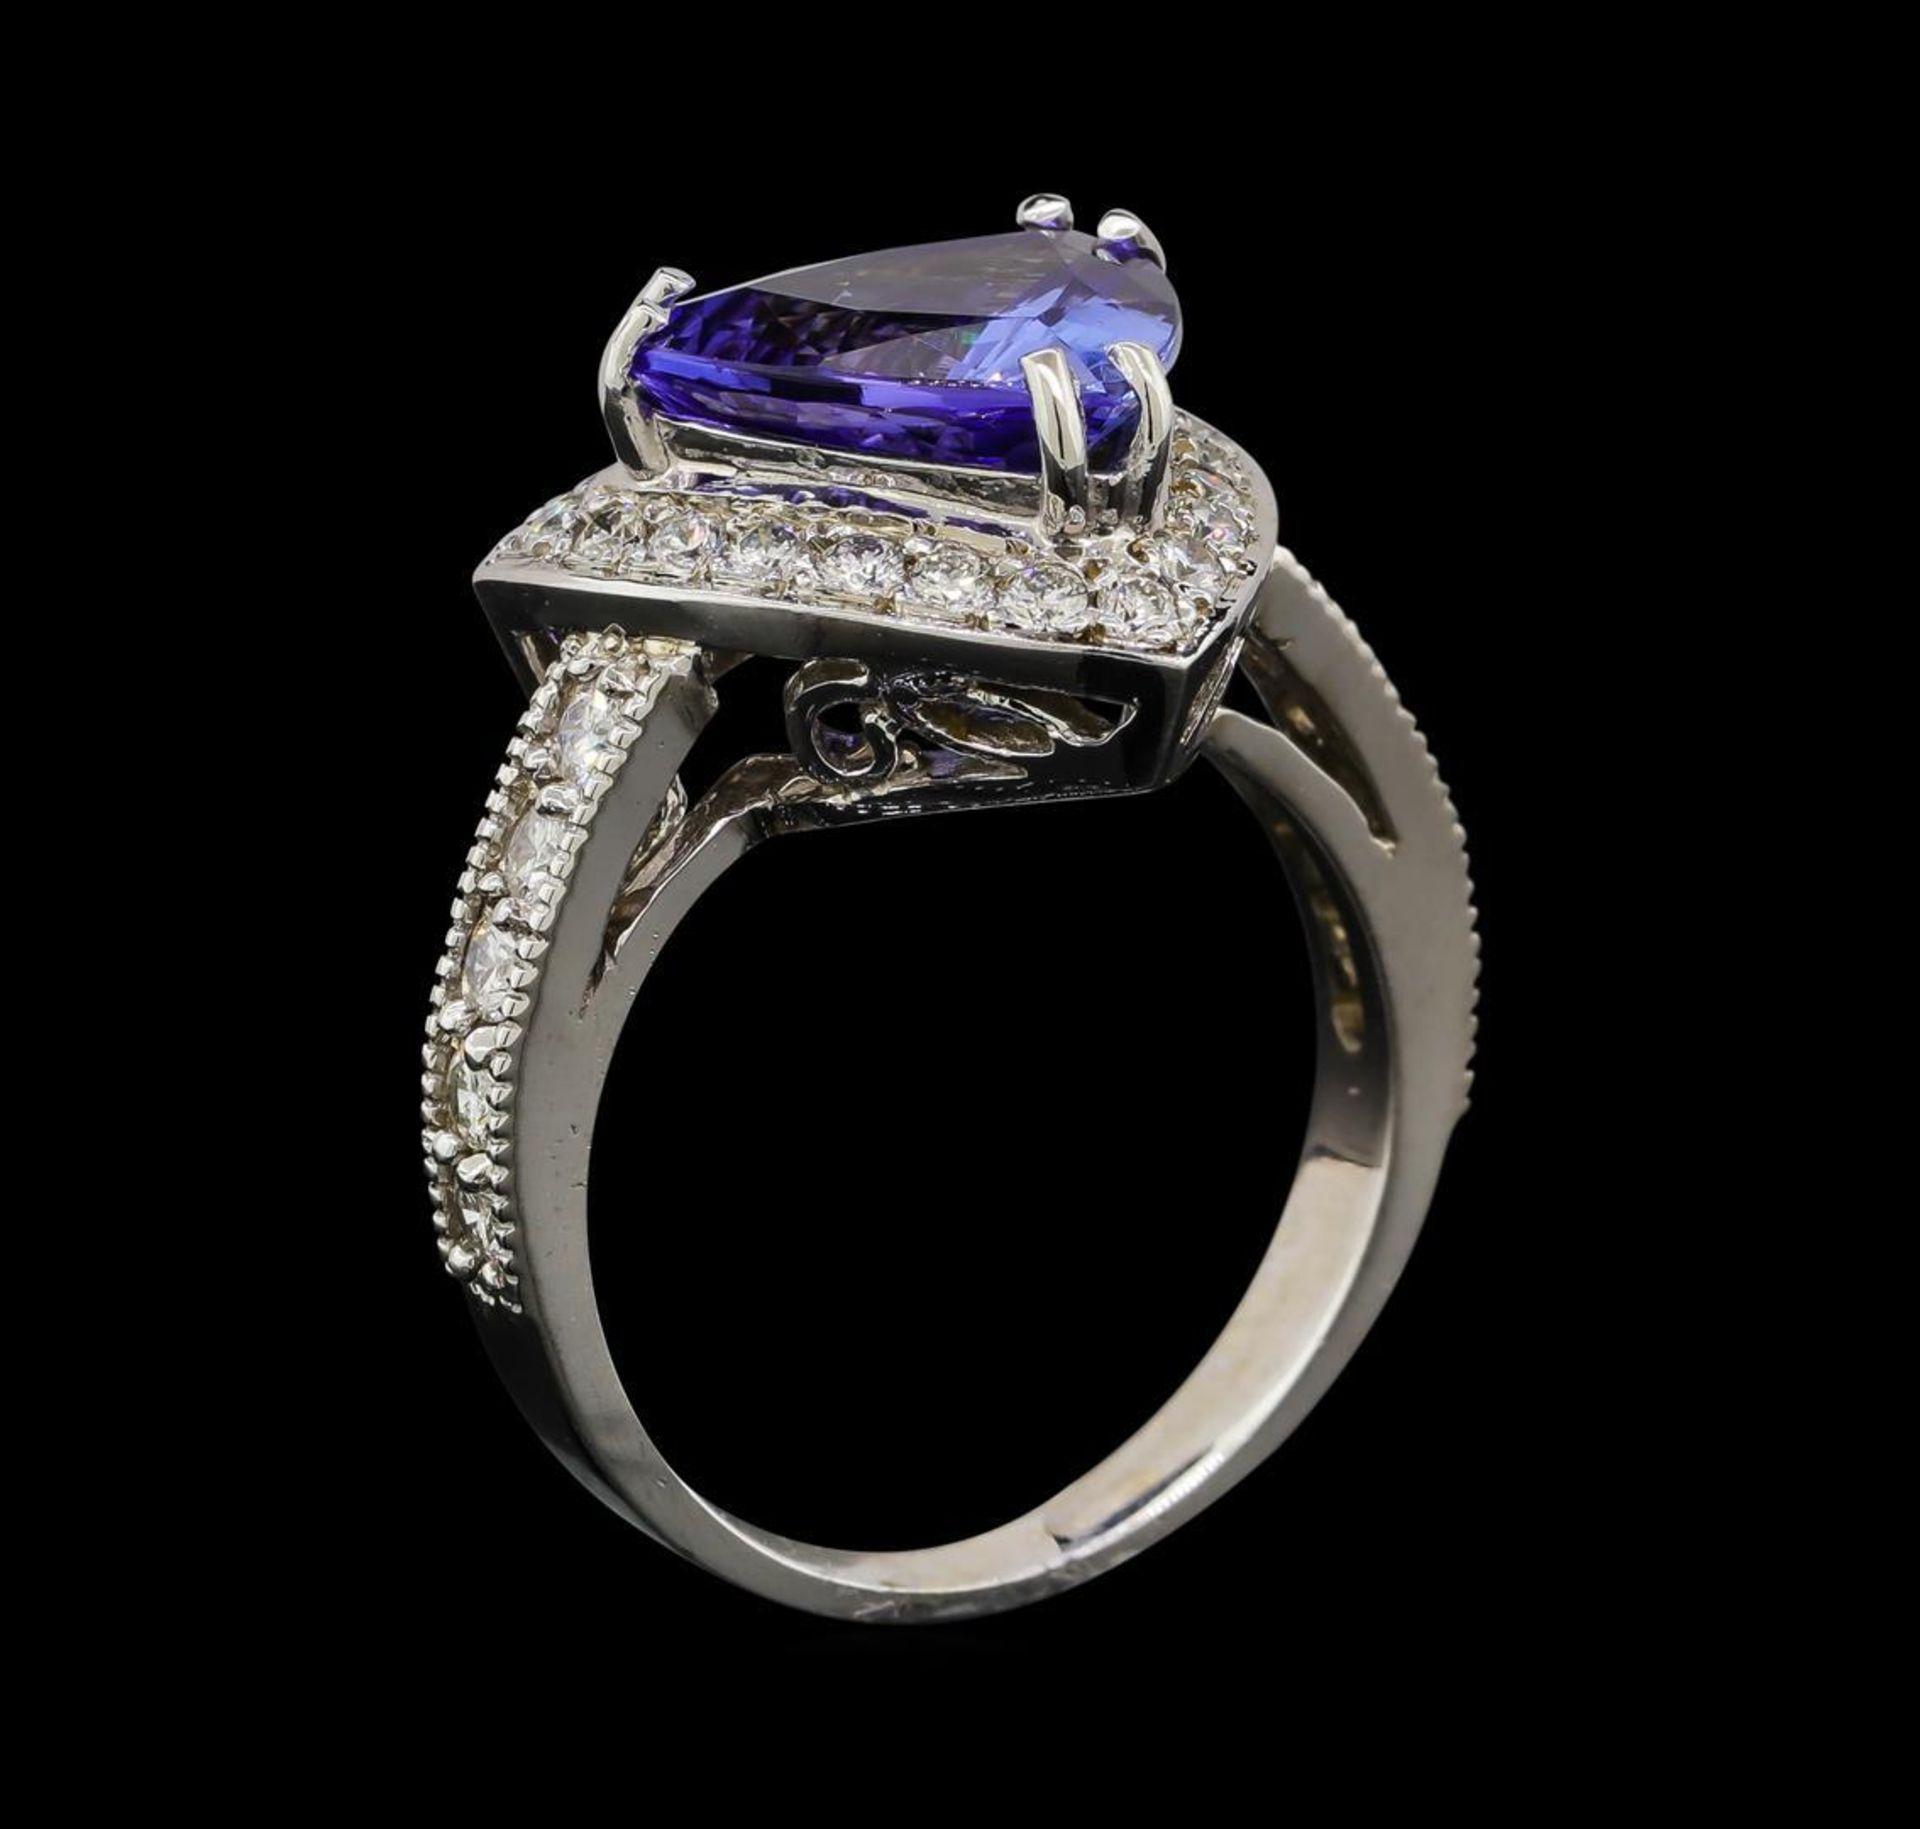 3.72 ctw Tanzanite and Diamond Ring - 14KT White Gold - Image 4 of 5